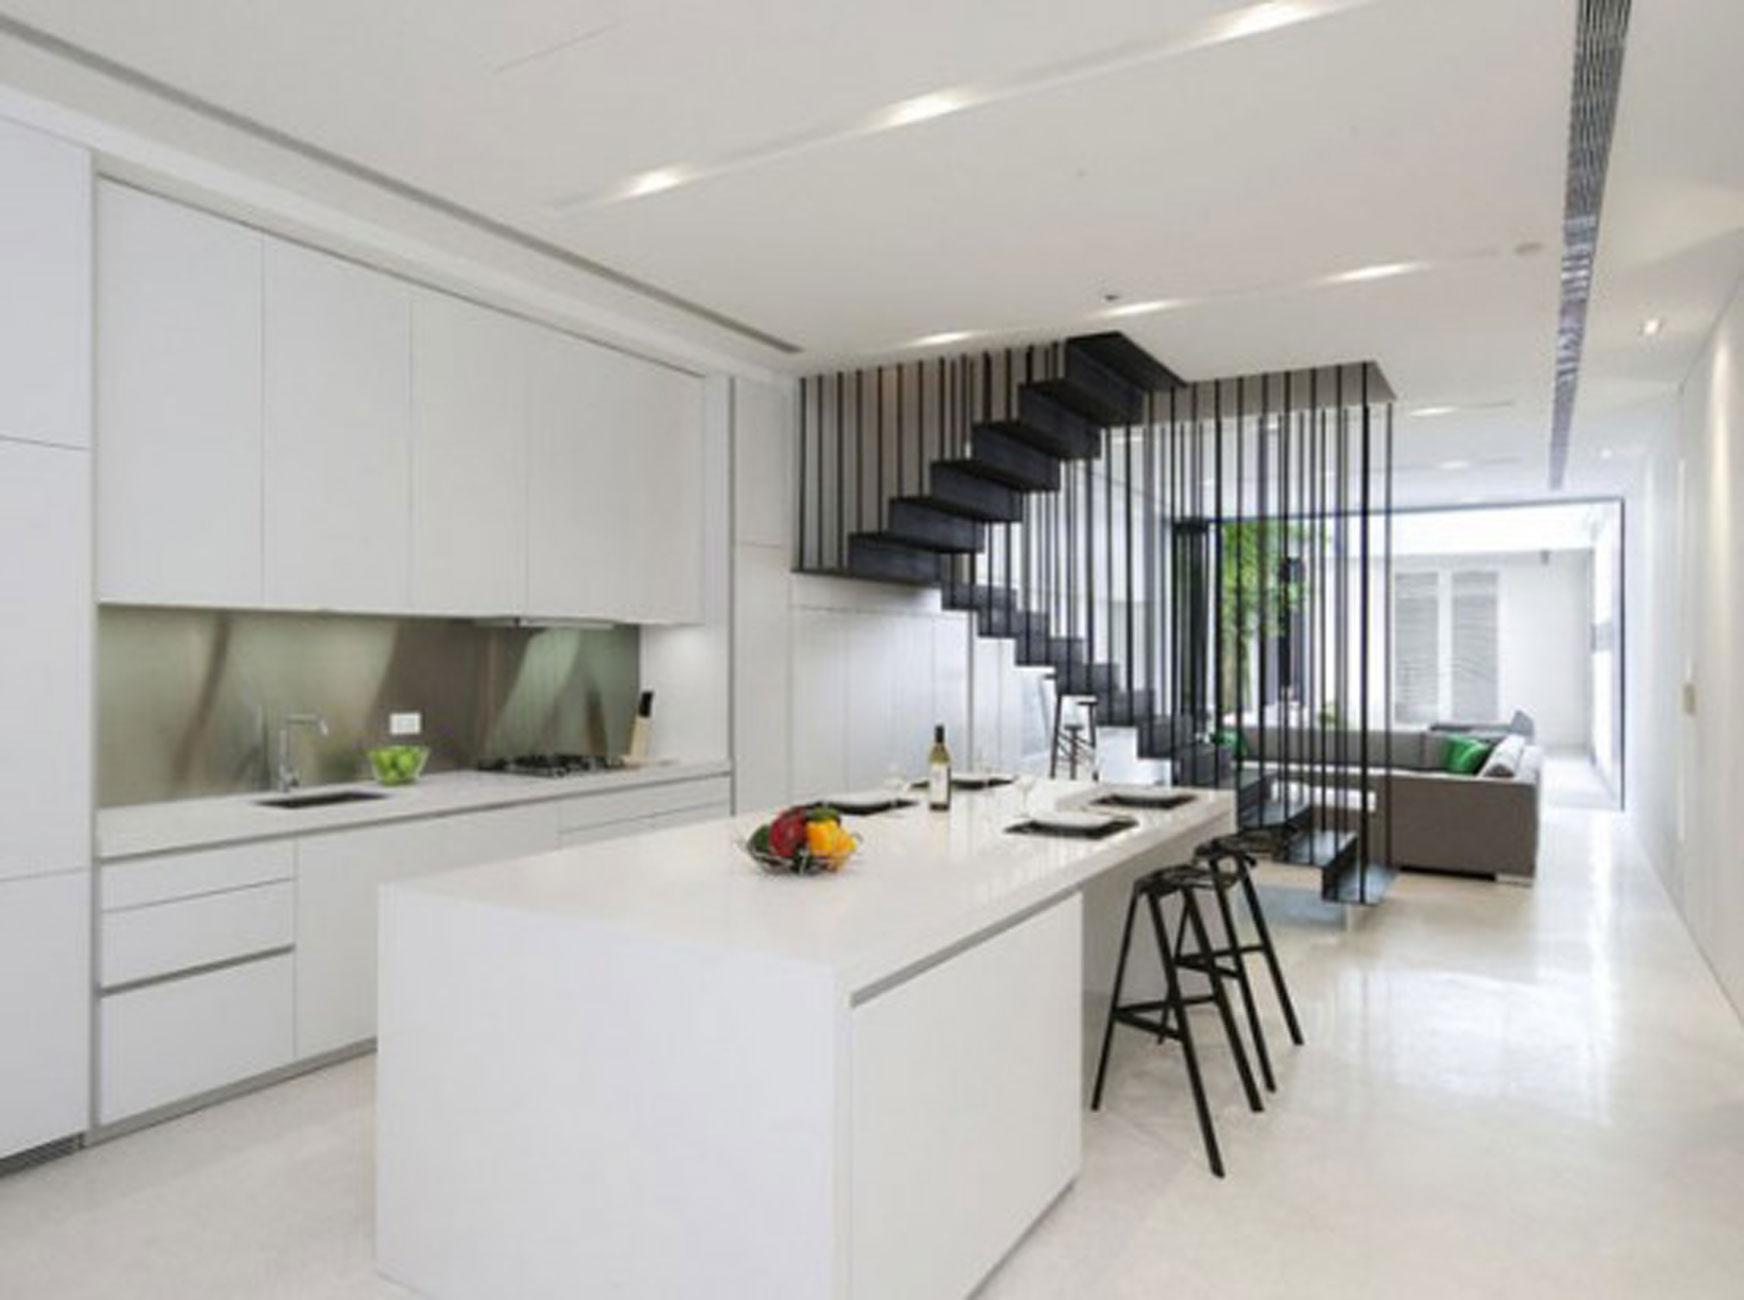 Modern building interior photo